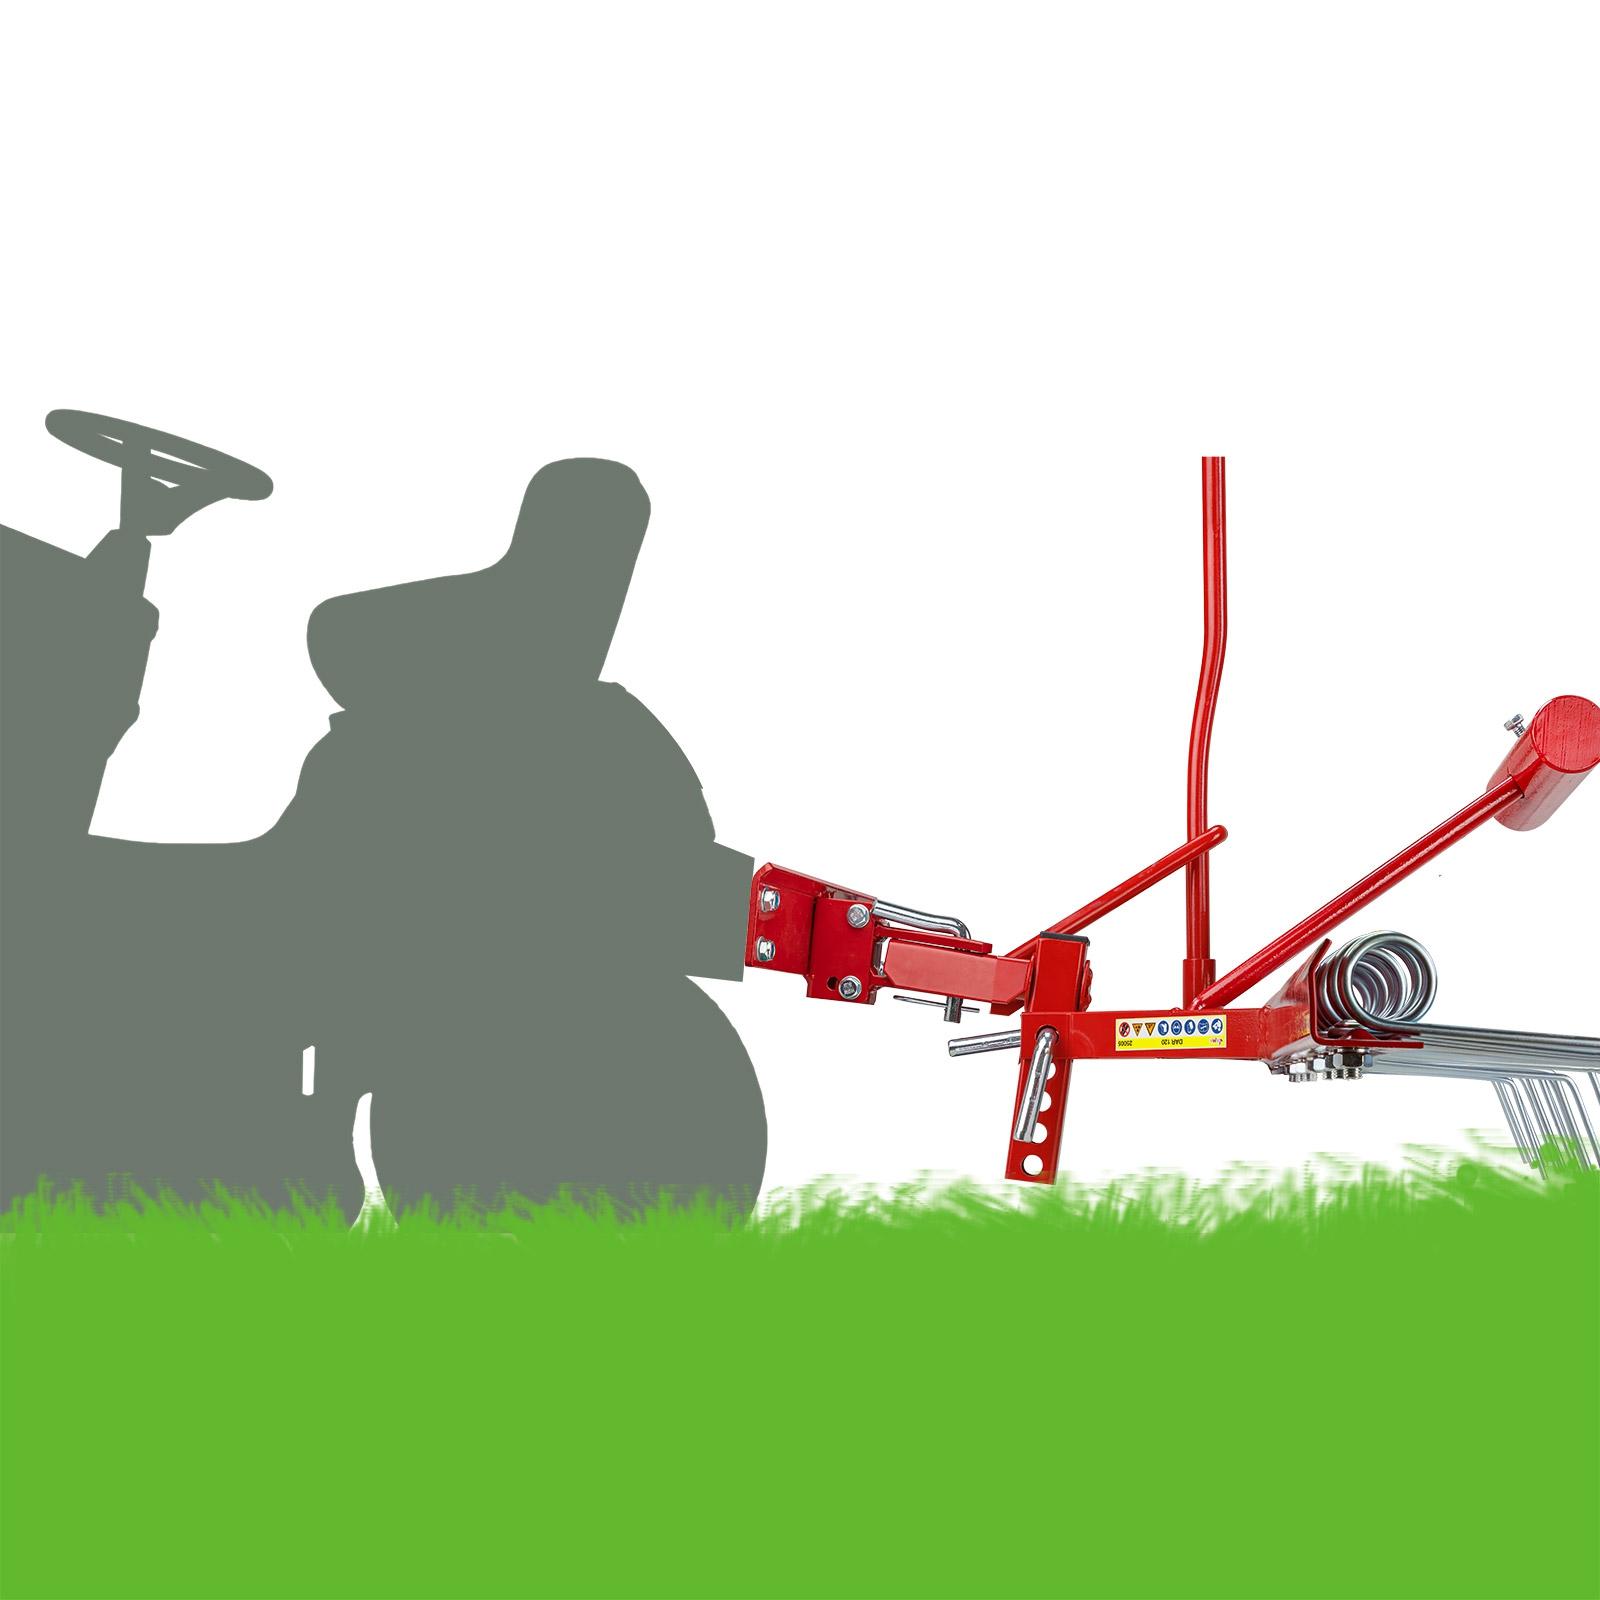 Dema Rasenstriegel Rasenkamm Entmooser Anbau für Traktor ATV 120 cm 25005